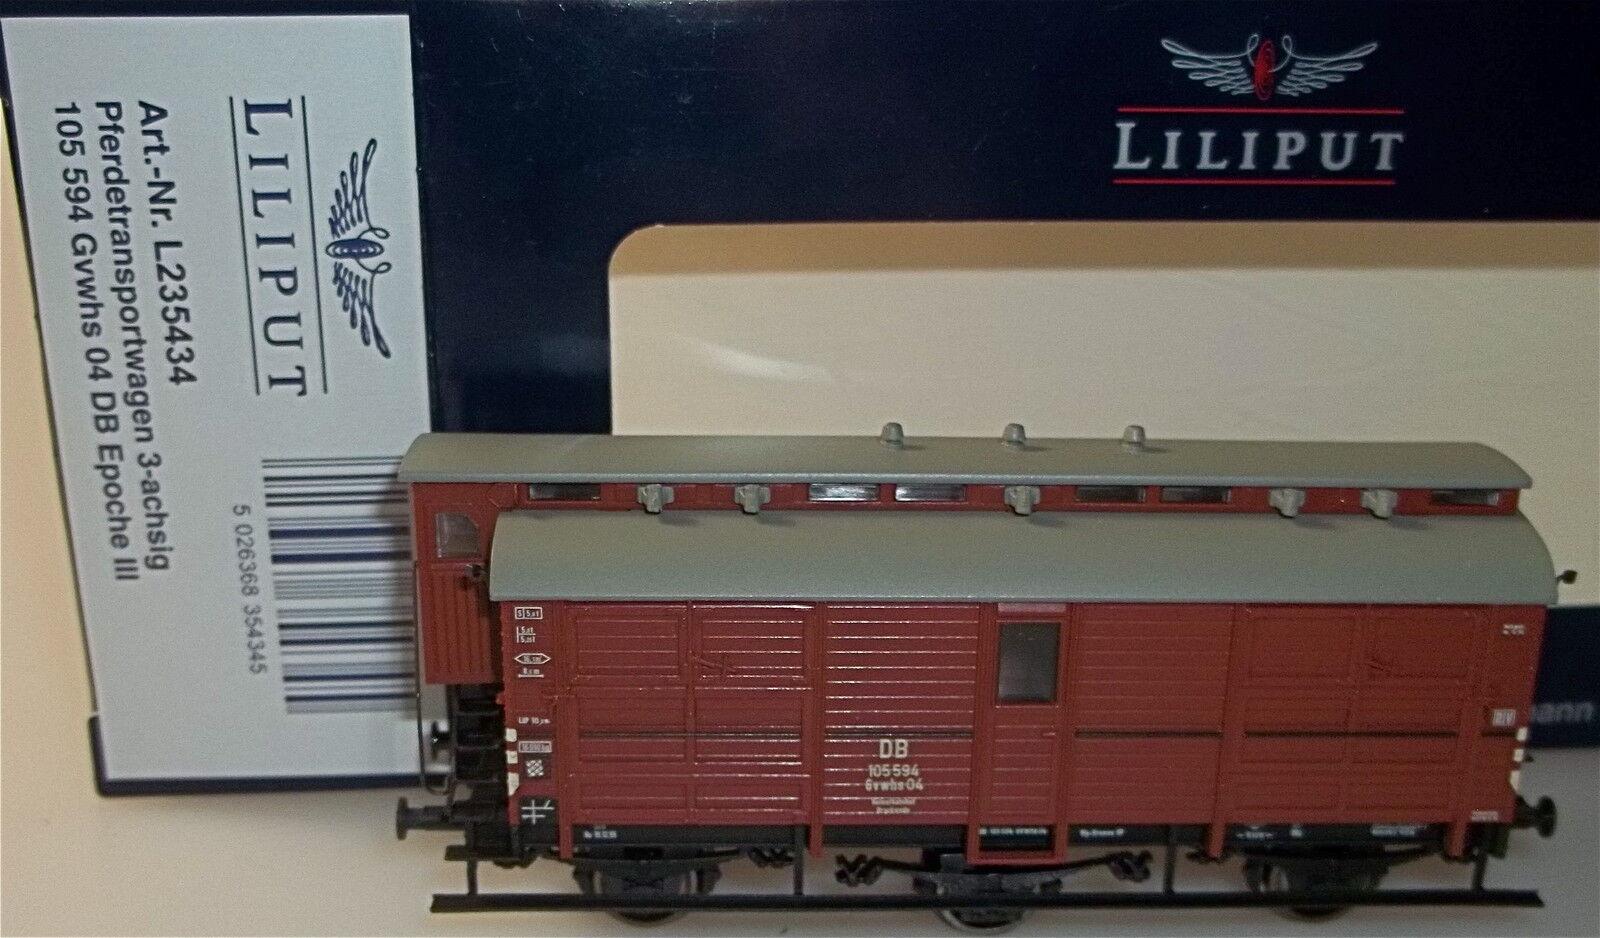 Horse Transport Waggon 3achs gvwhs 105594 DB EP3 Liliput l235434 H0 1 87 OVP